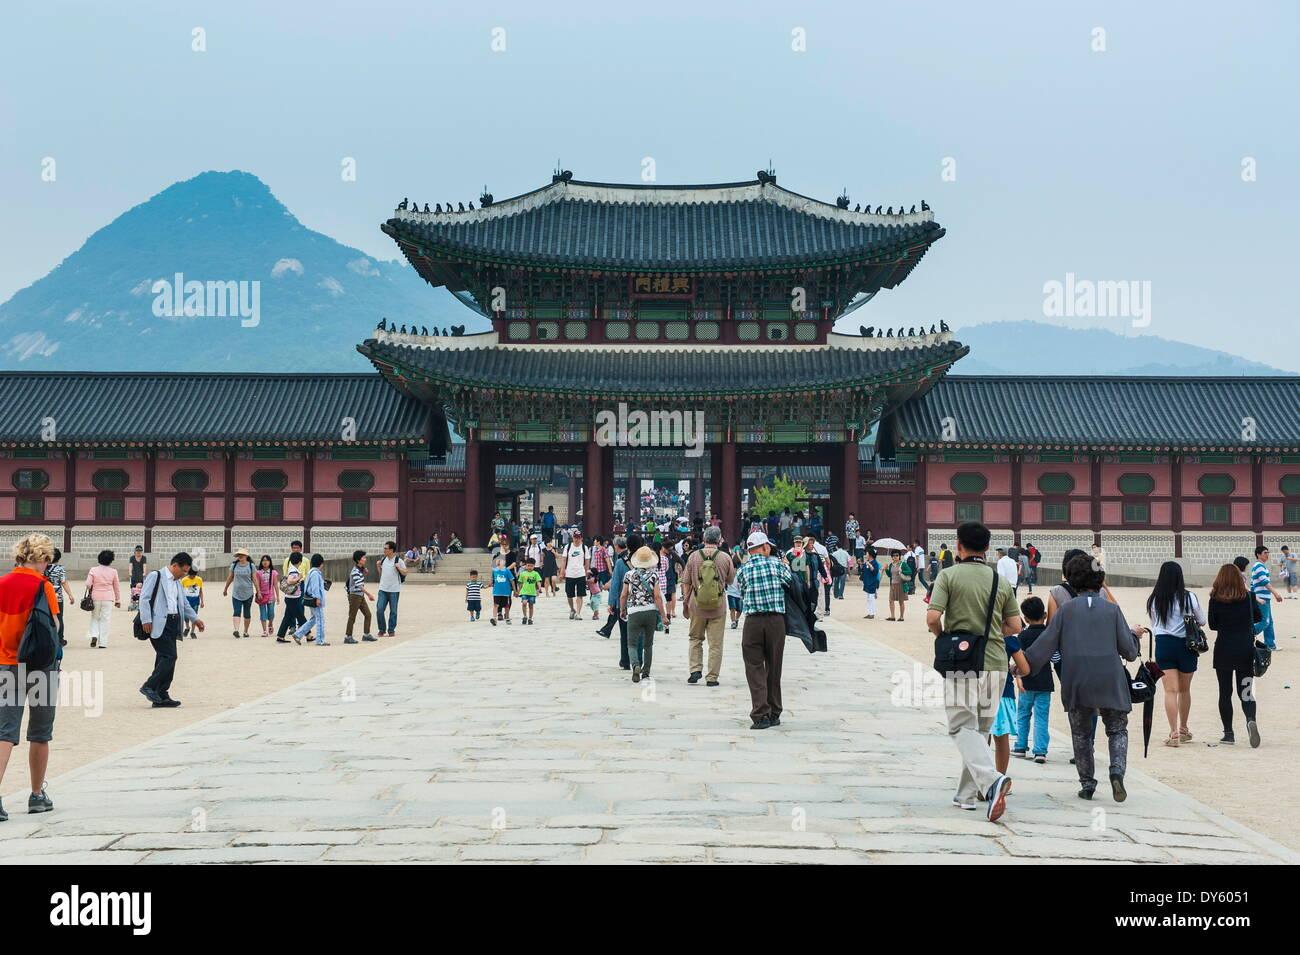 Tourists walking to the Gyeongbokgung Palace, Seoul, South Korea, Asia - Stock Image